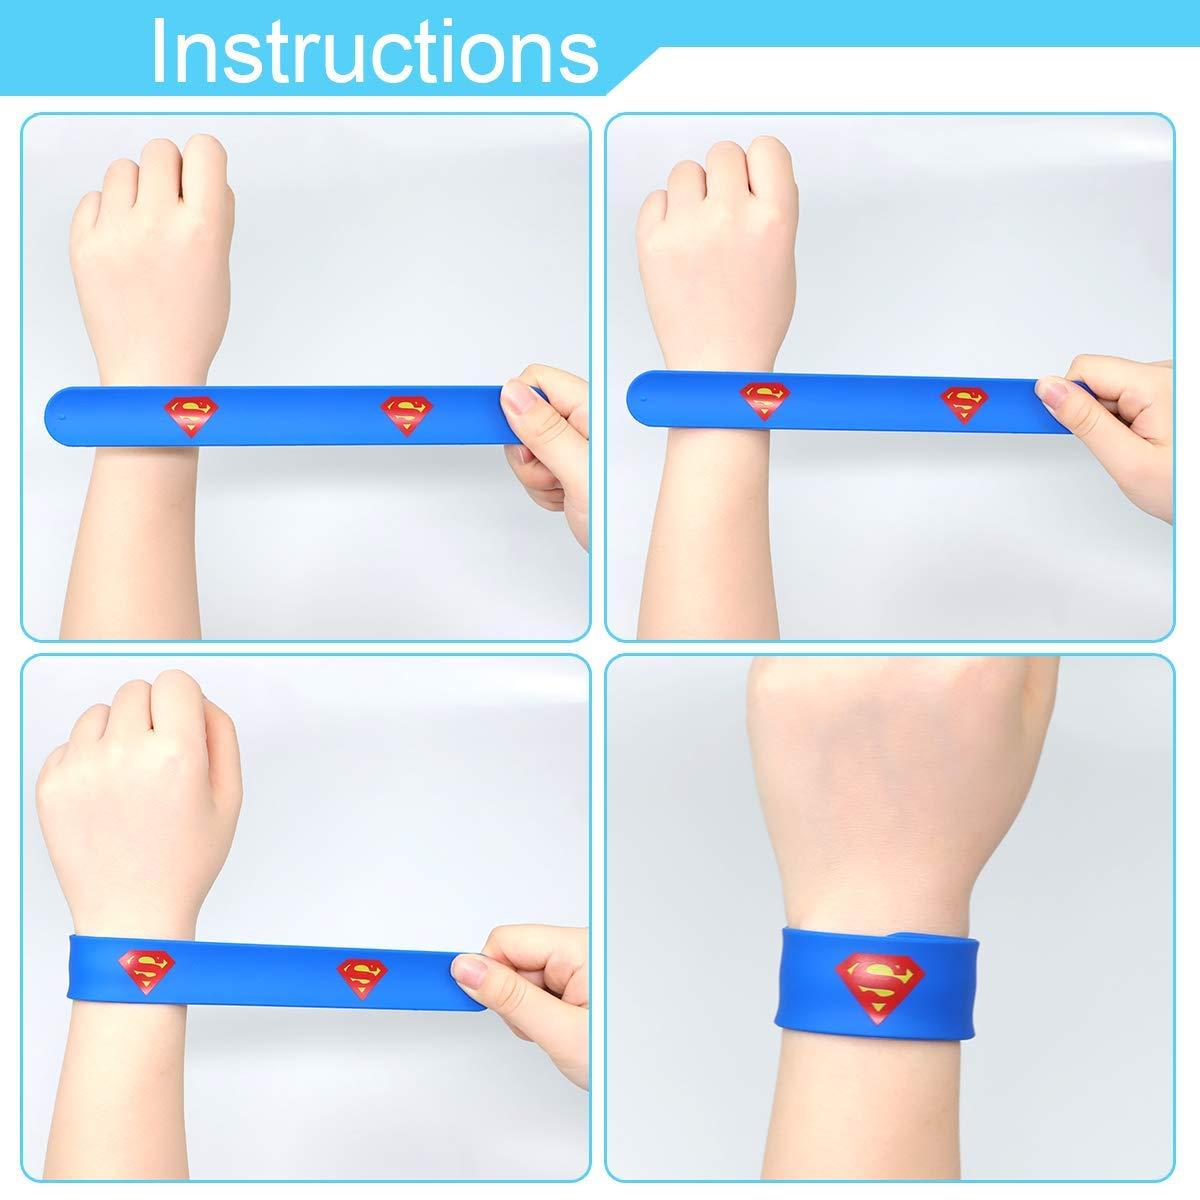 POKONBOY Superhero Slap Bracelets for Kids Party favors - 24 Pack Slap Bracelets for Boys Girls Kids Super Hero Birthday Party Favors Supplies Carnival Boys Prizes by POKONBOY (Image #5)